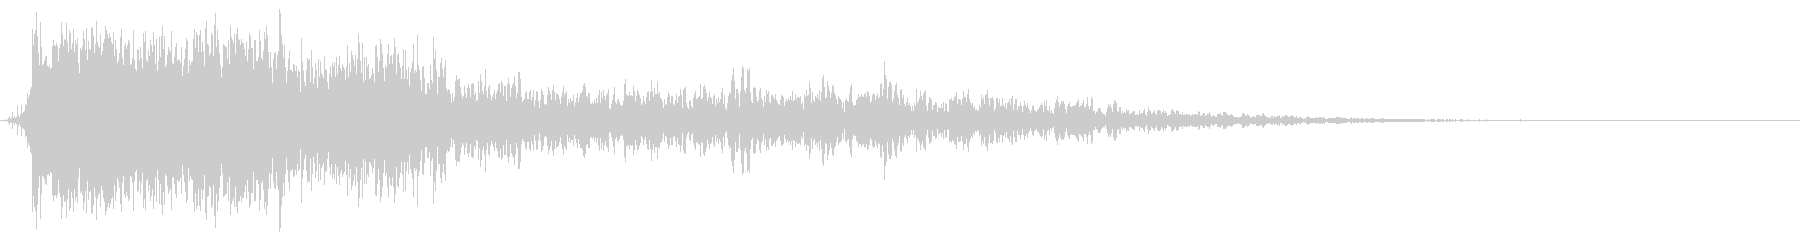 SynthSweep EC03_37_2の未再生の波形